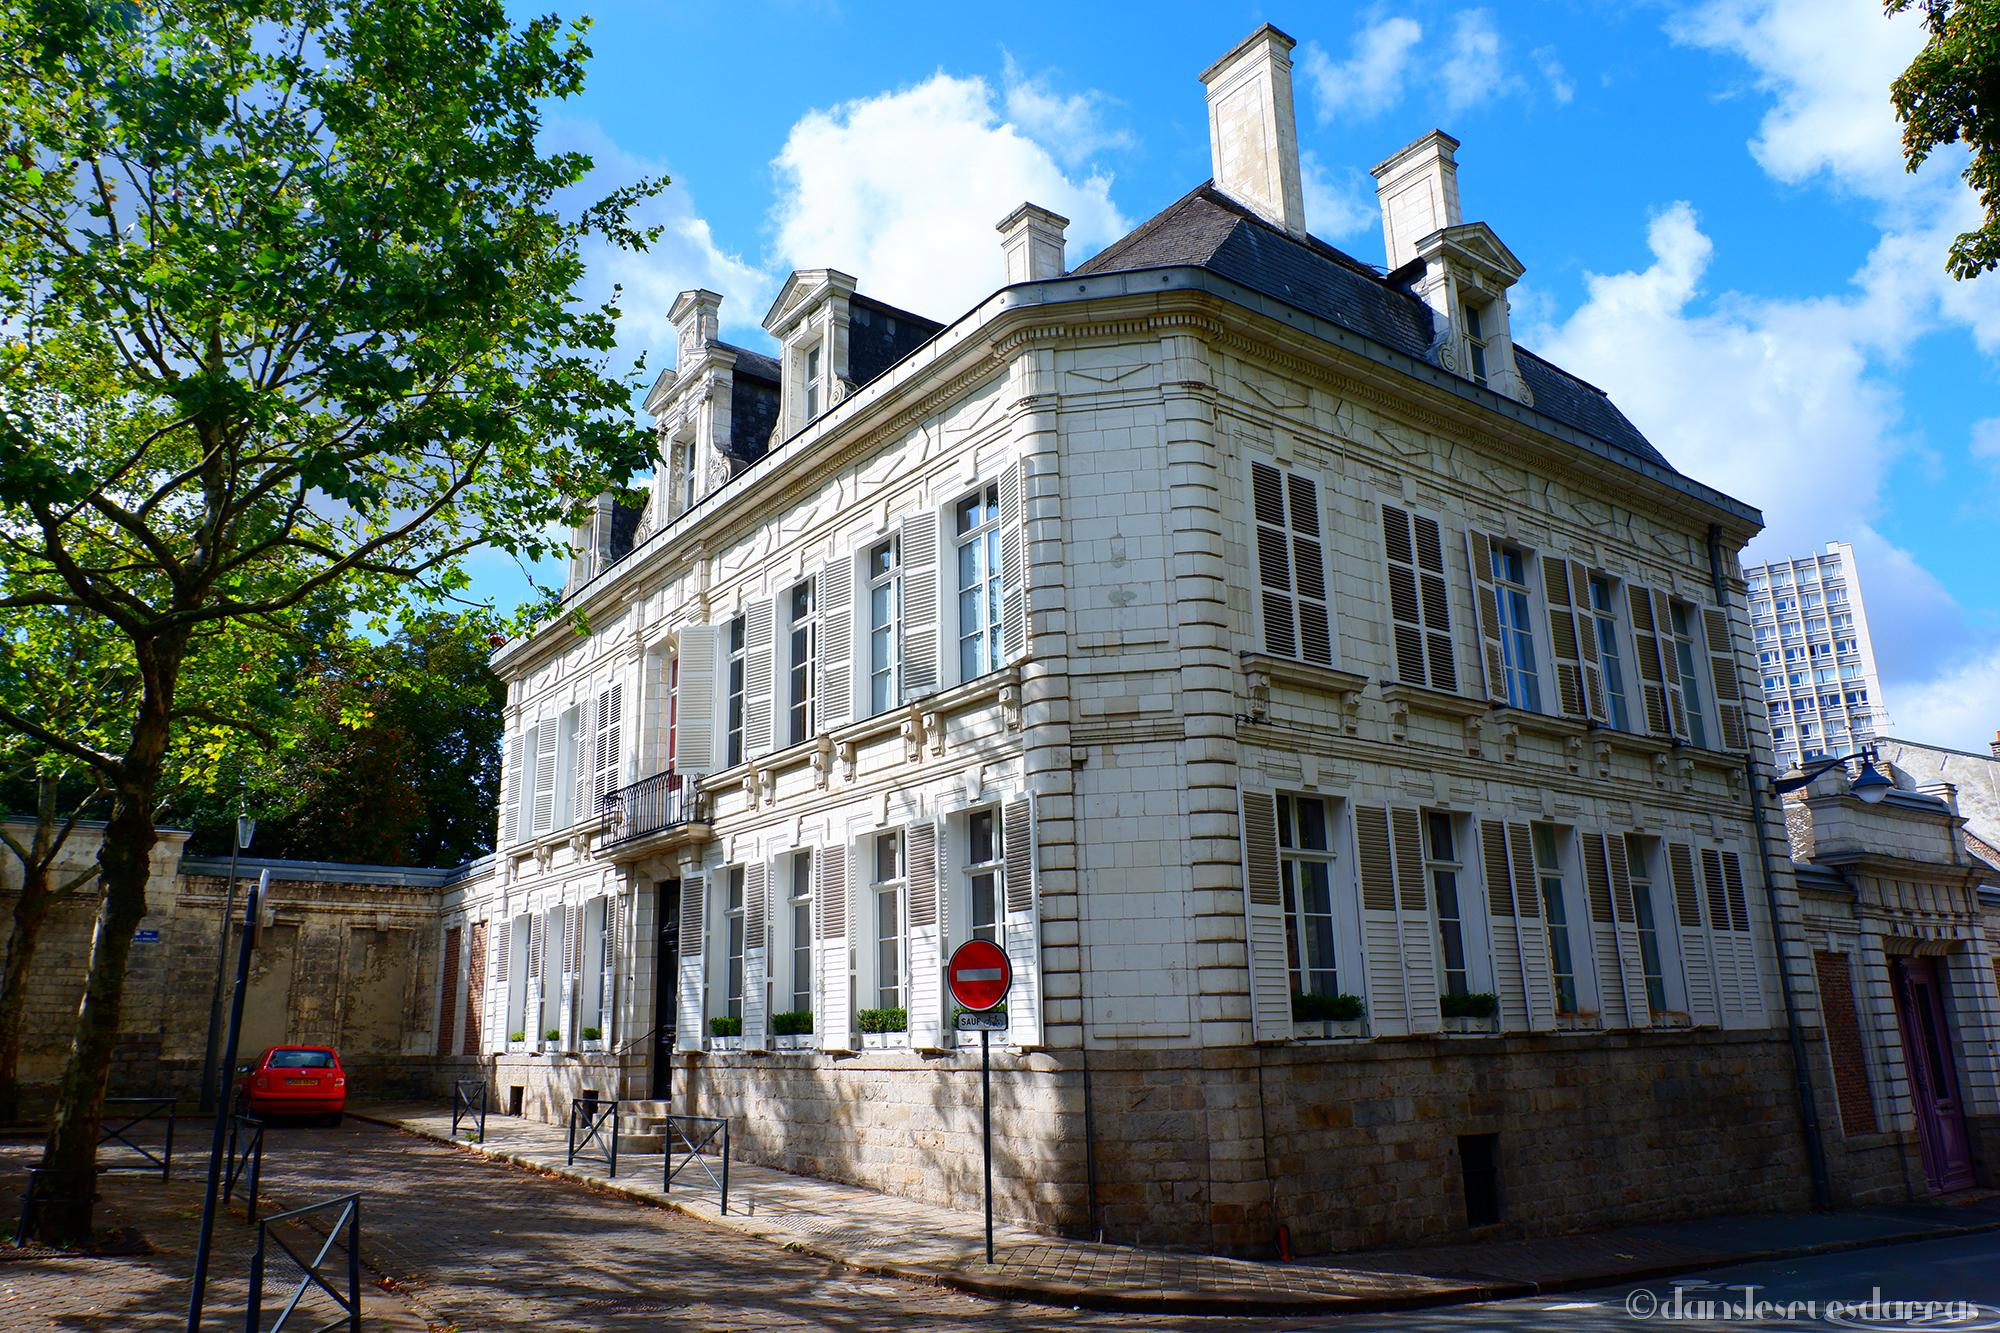 Hôtel Danten - 33 rue Paul Doumer - Arras (©MD - danslesruesdarras)